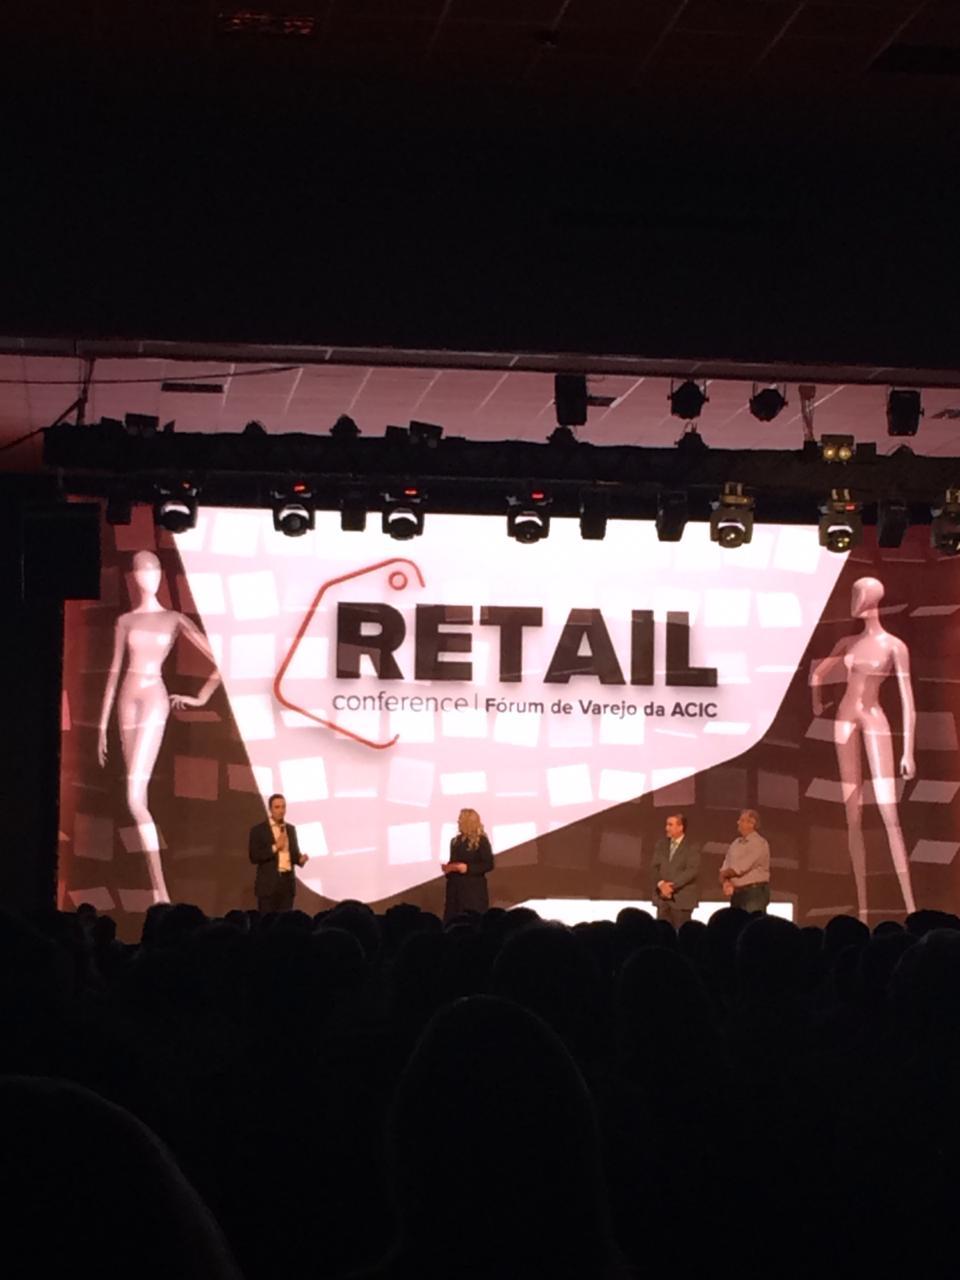 2 – Retail Conference – Abertura do evento